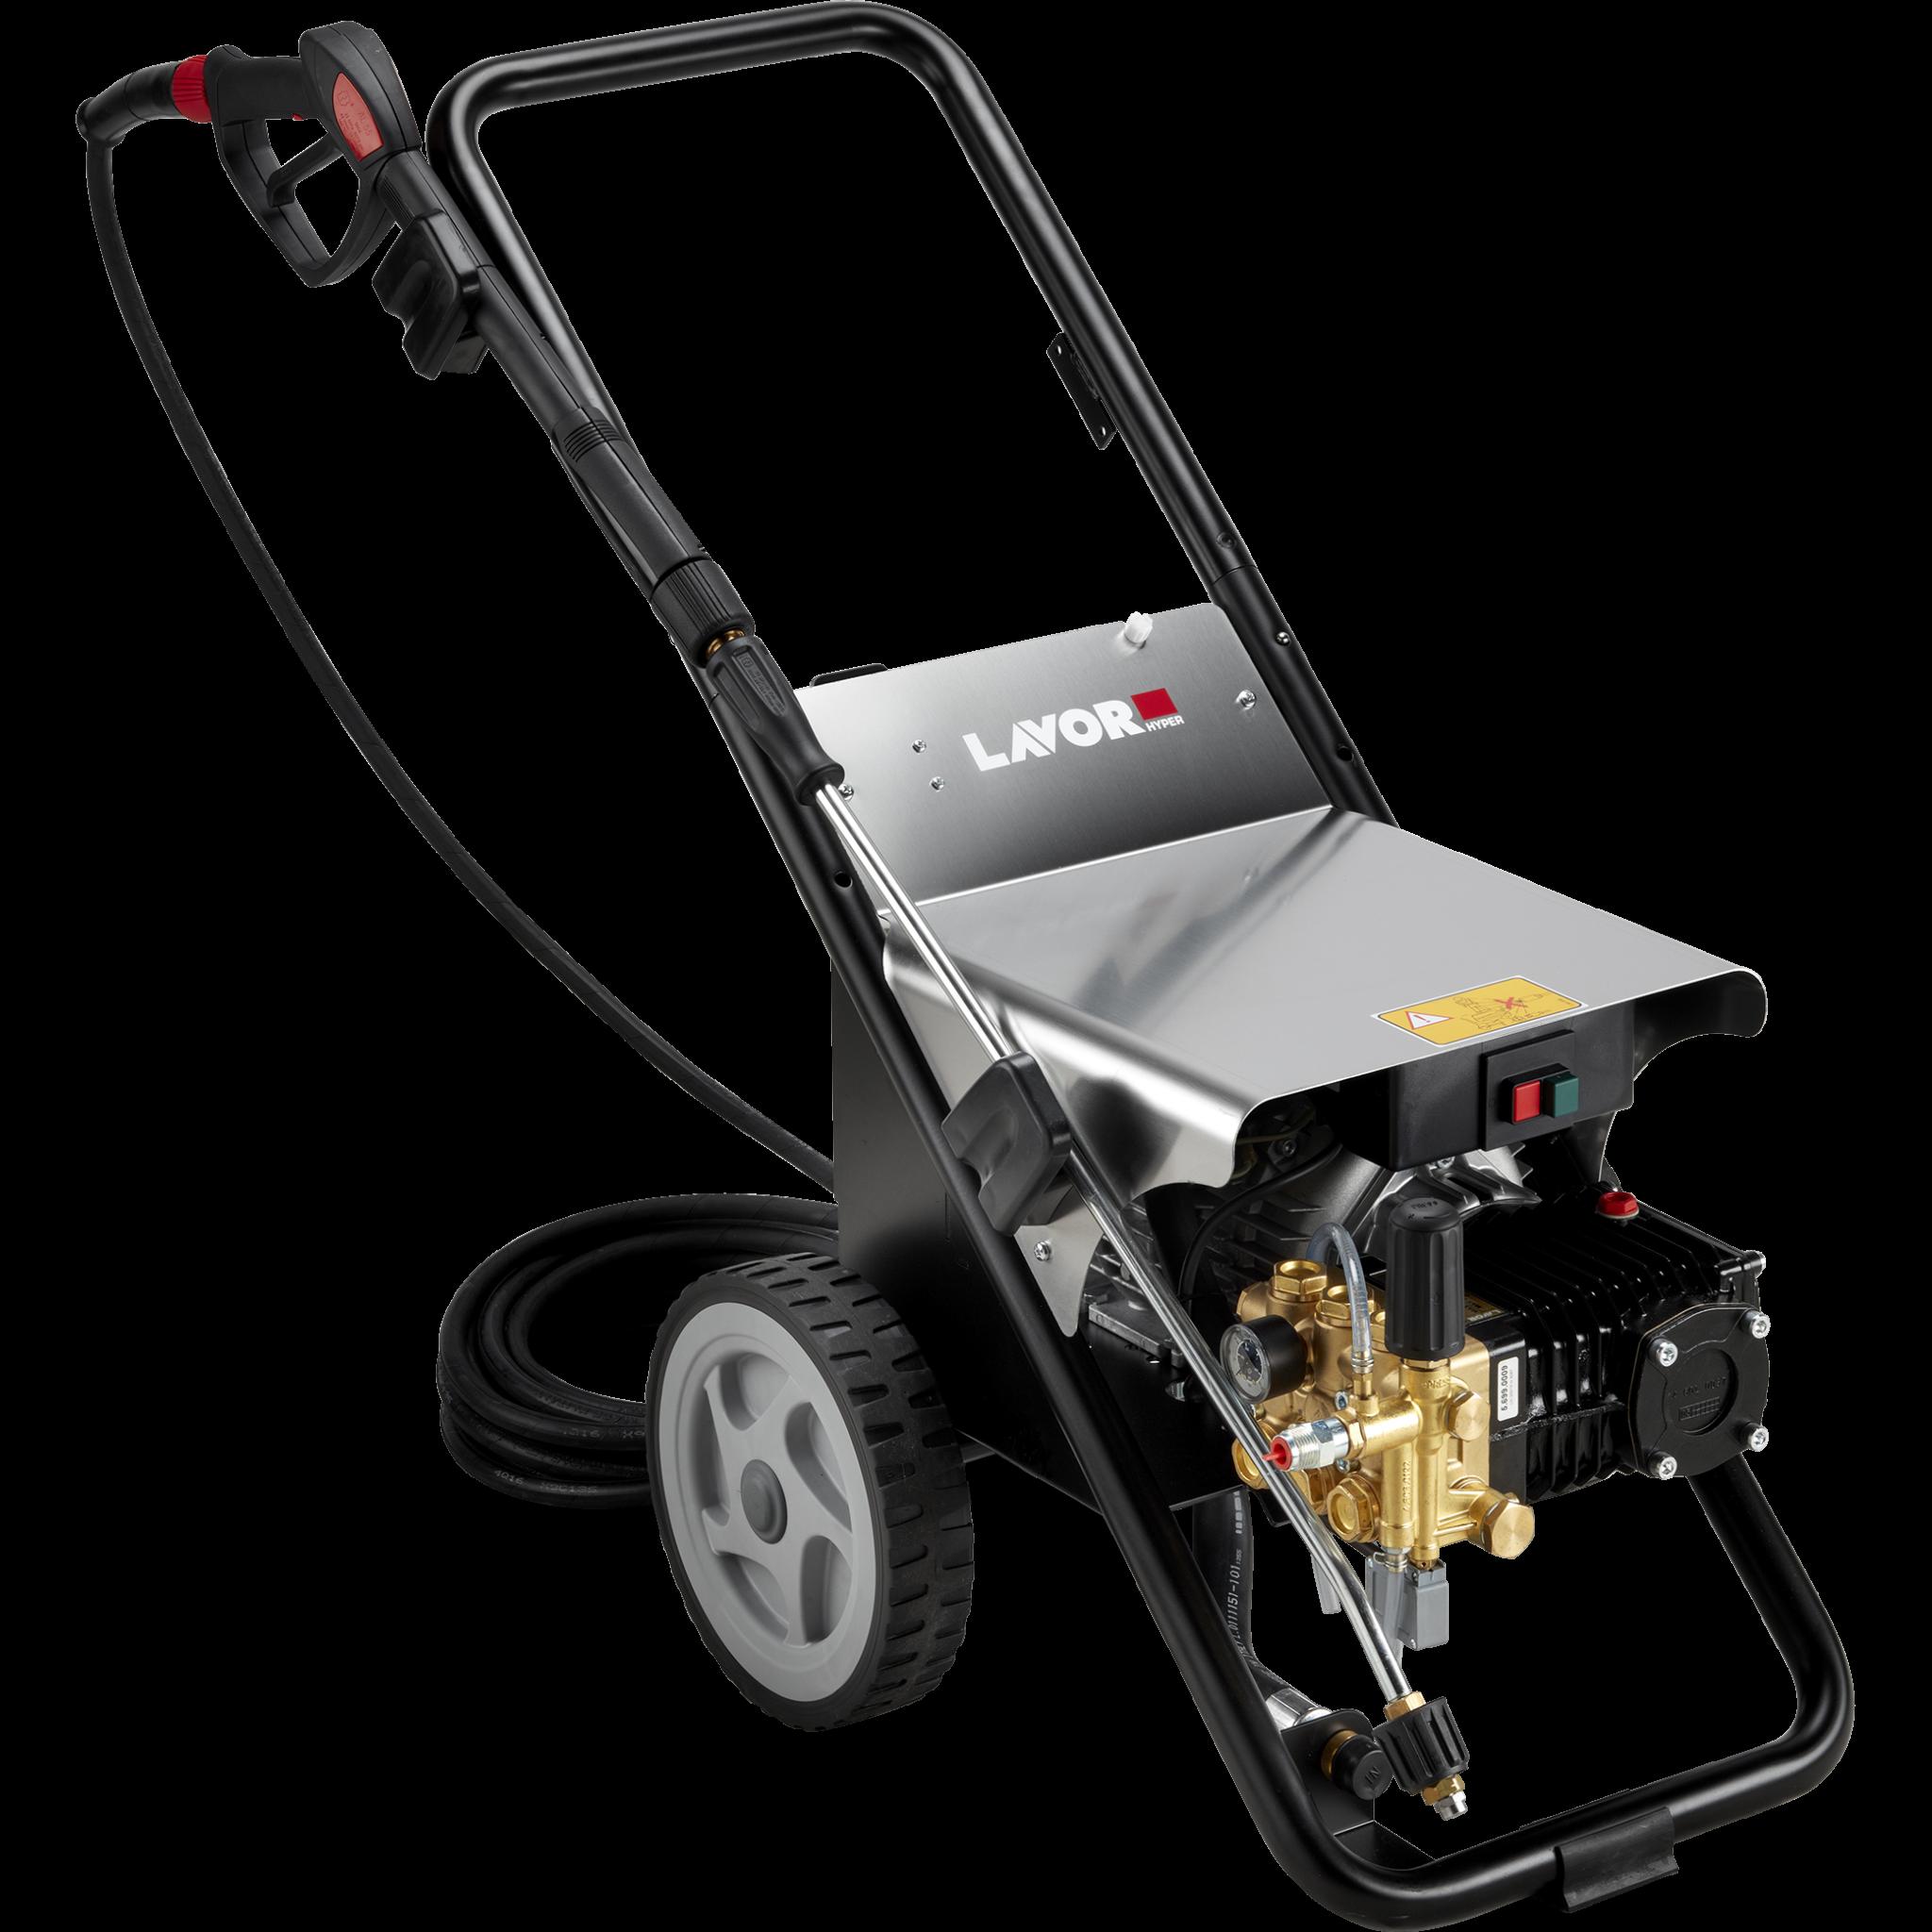 Hyperc2021 Pressure Cleaner Lavorwash Australia